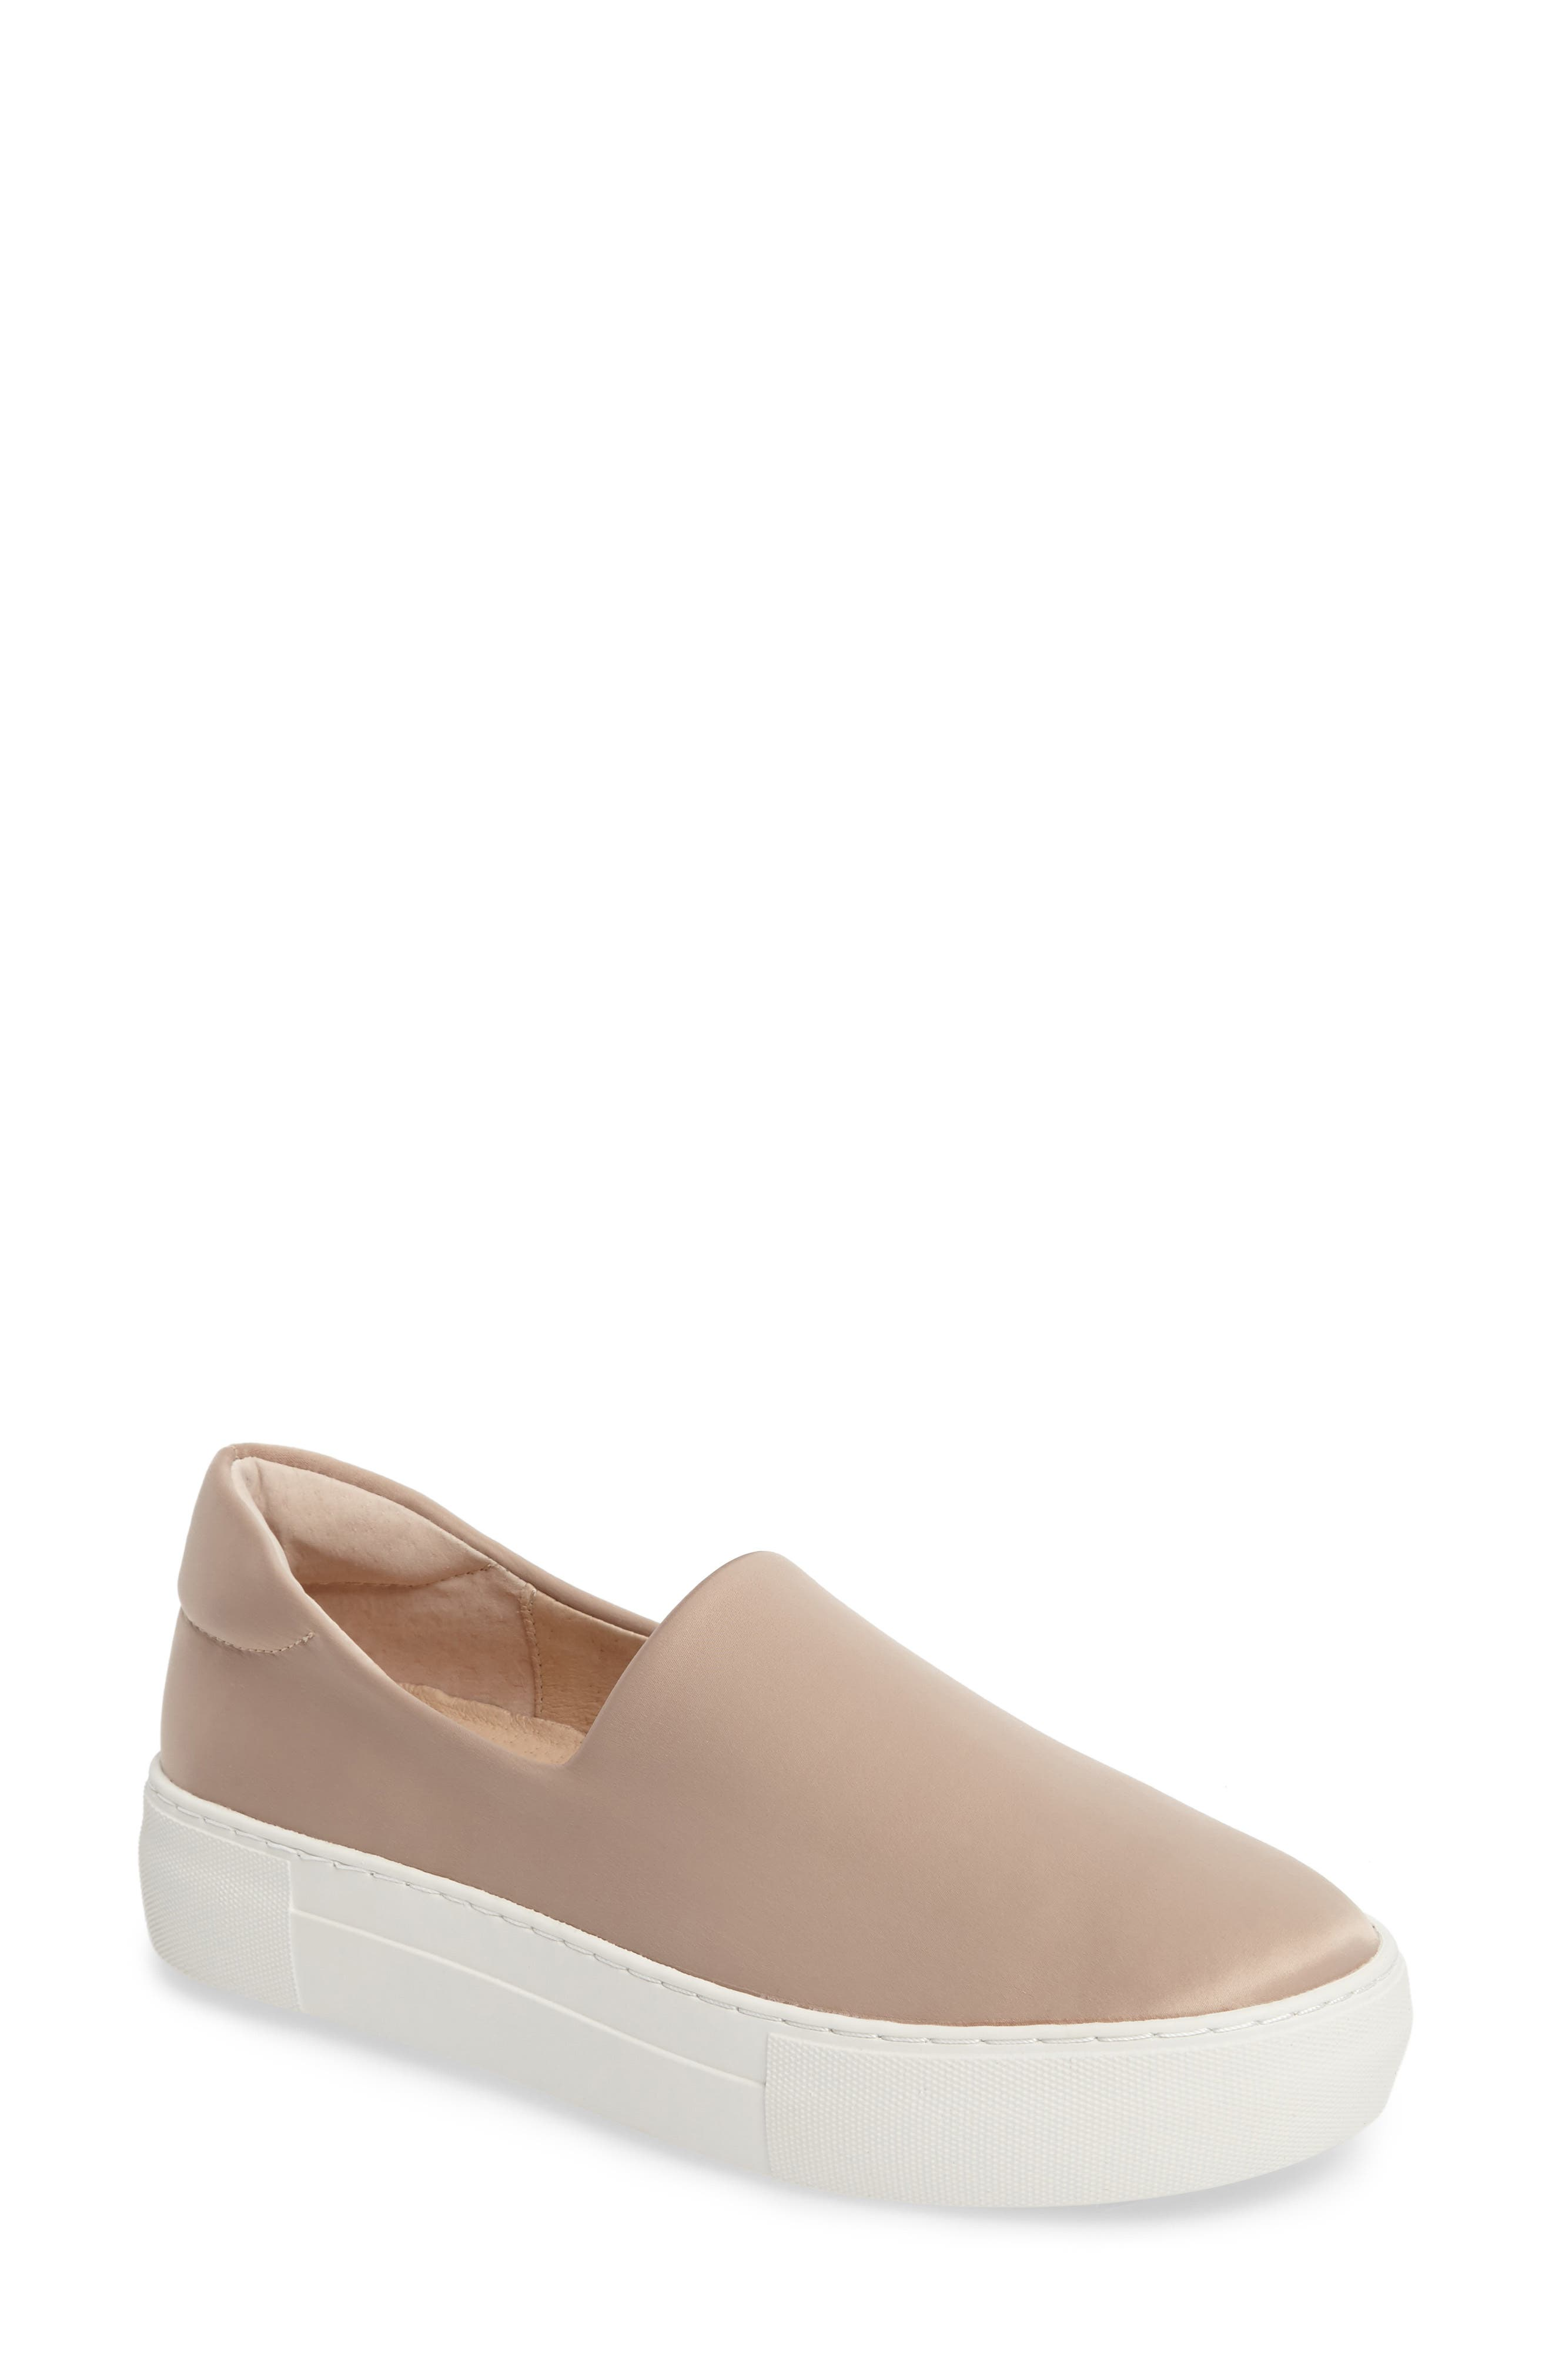 Abba Slip-On Platform Sneaker,                         Main,                         color, Champagne Satin